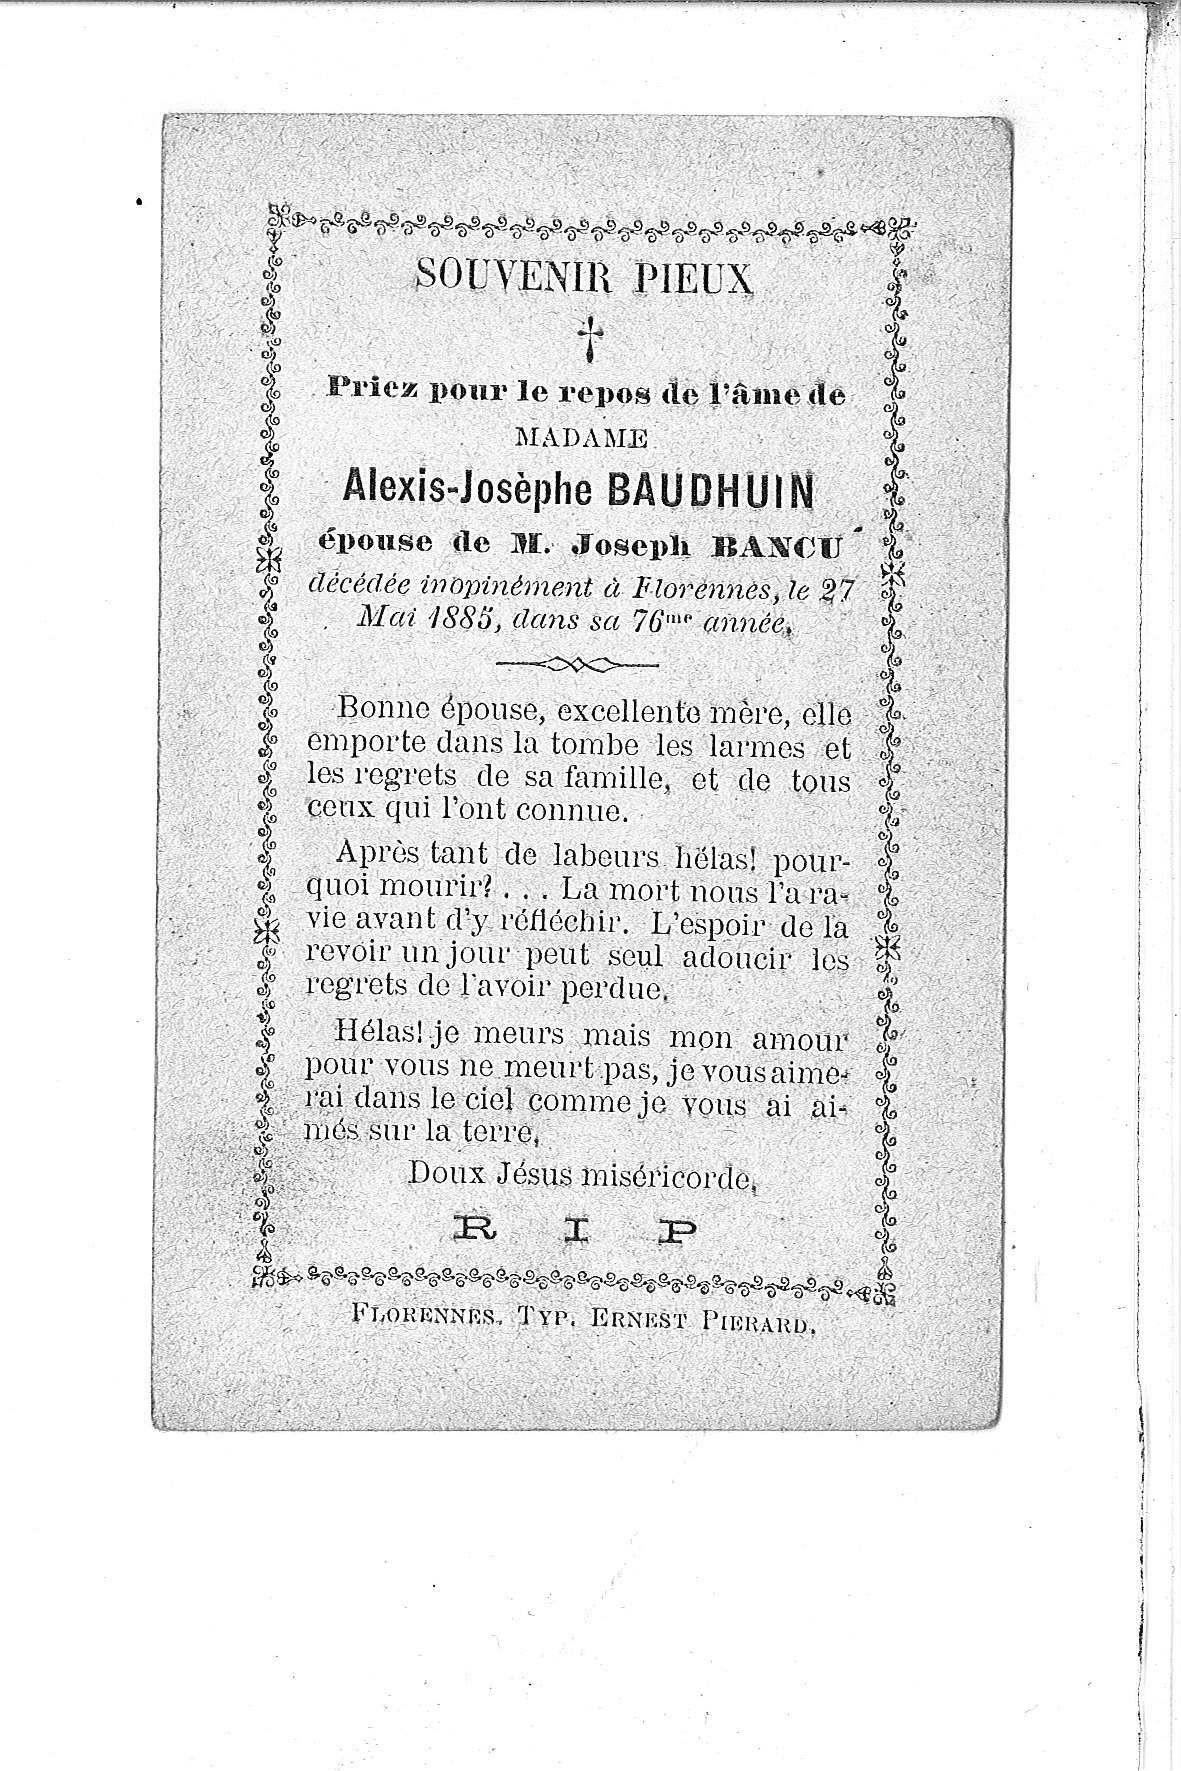 Alexis-Josèphe(1885)20101022082750_00032.jpg